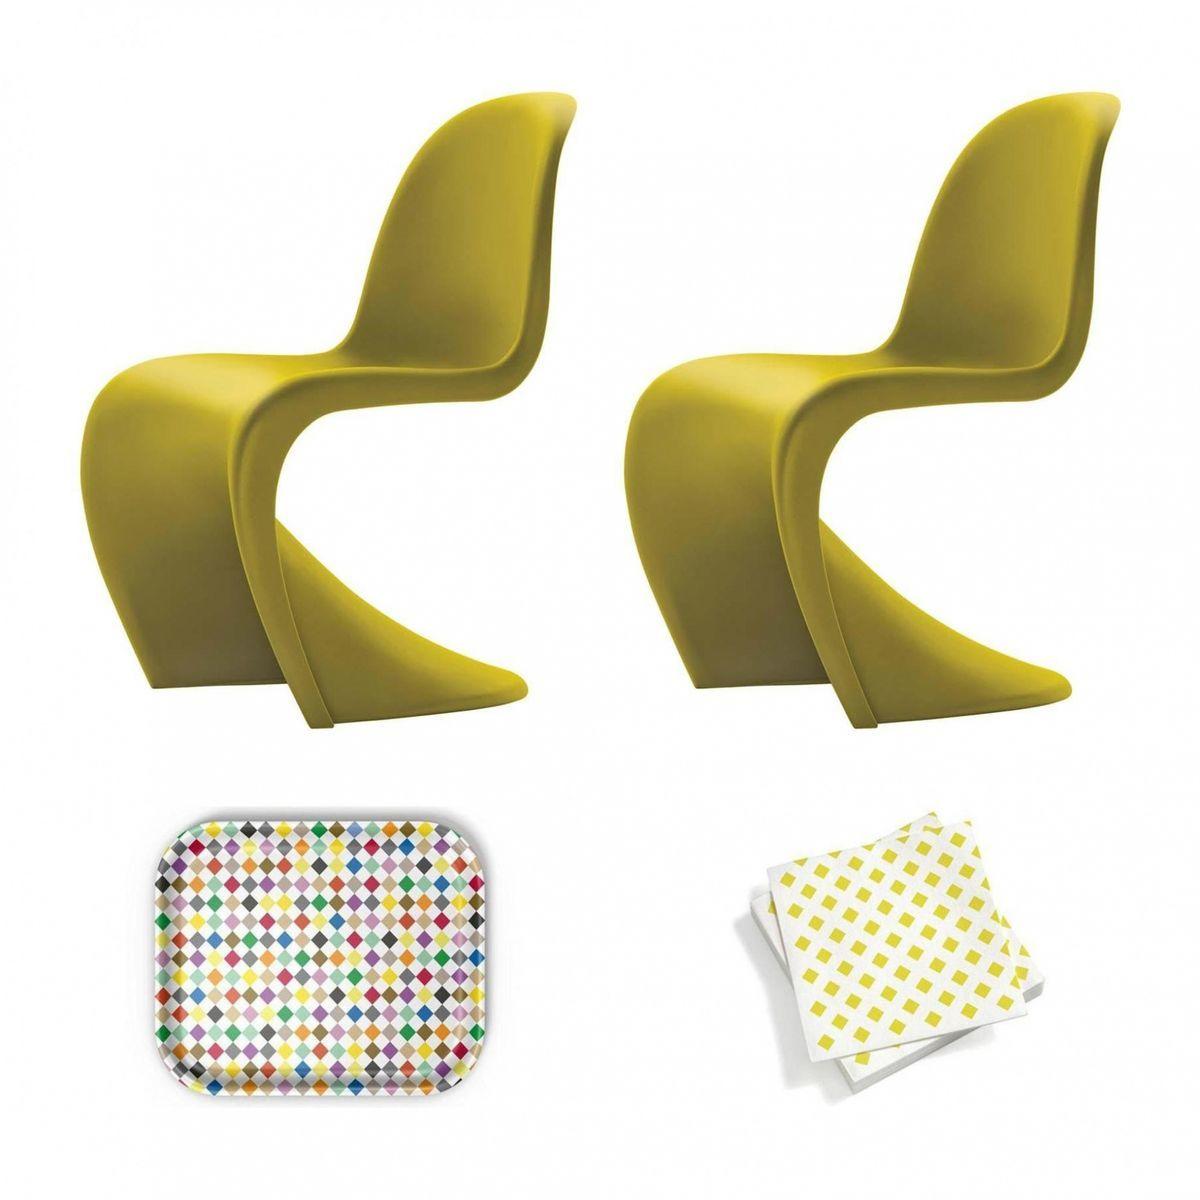 vitra promotion set panton chair - Panton Chair